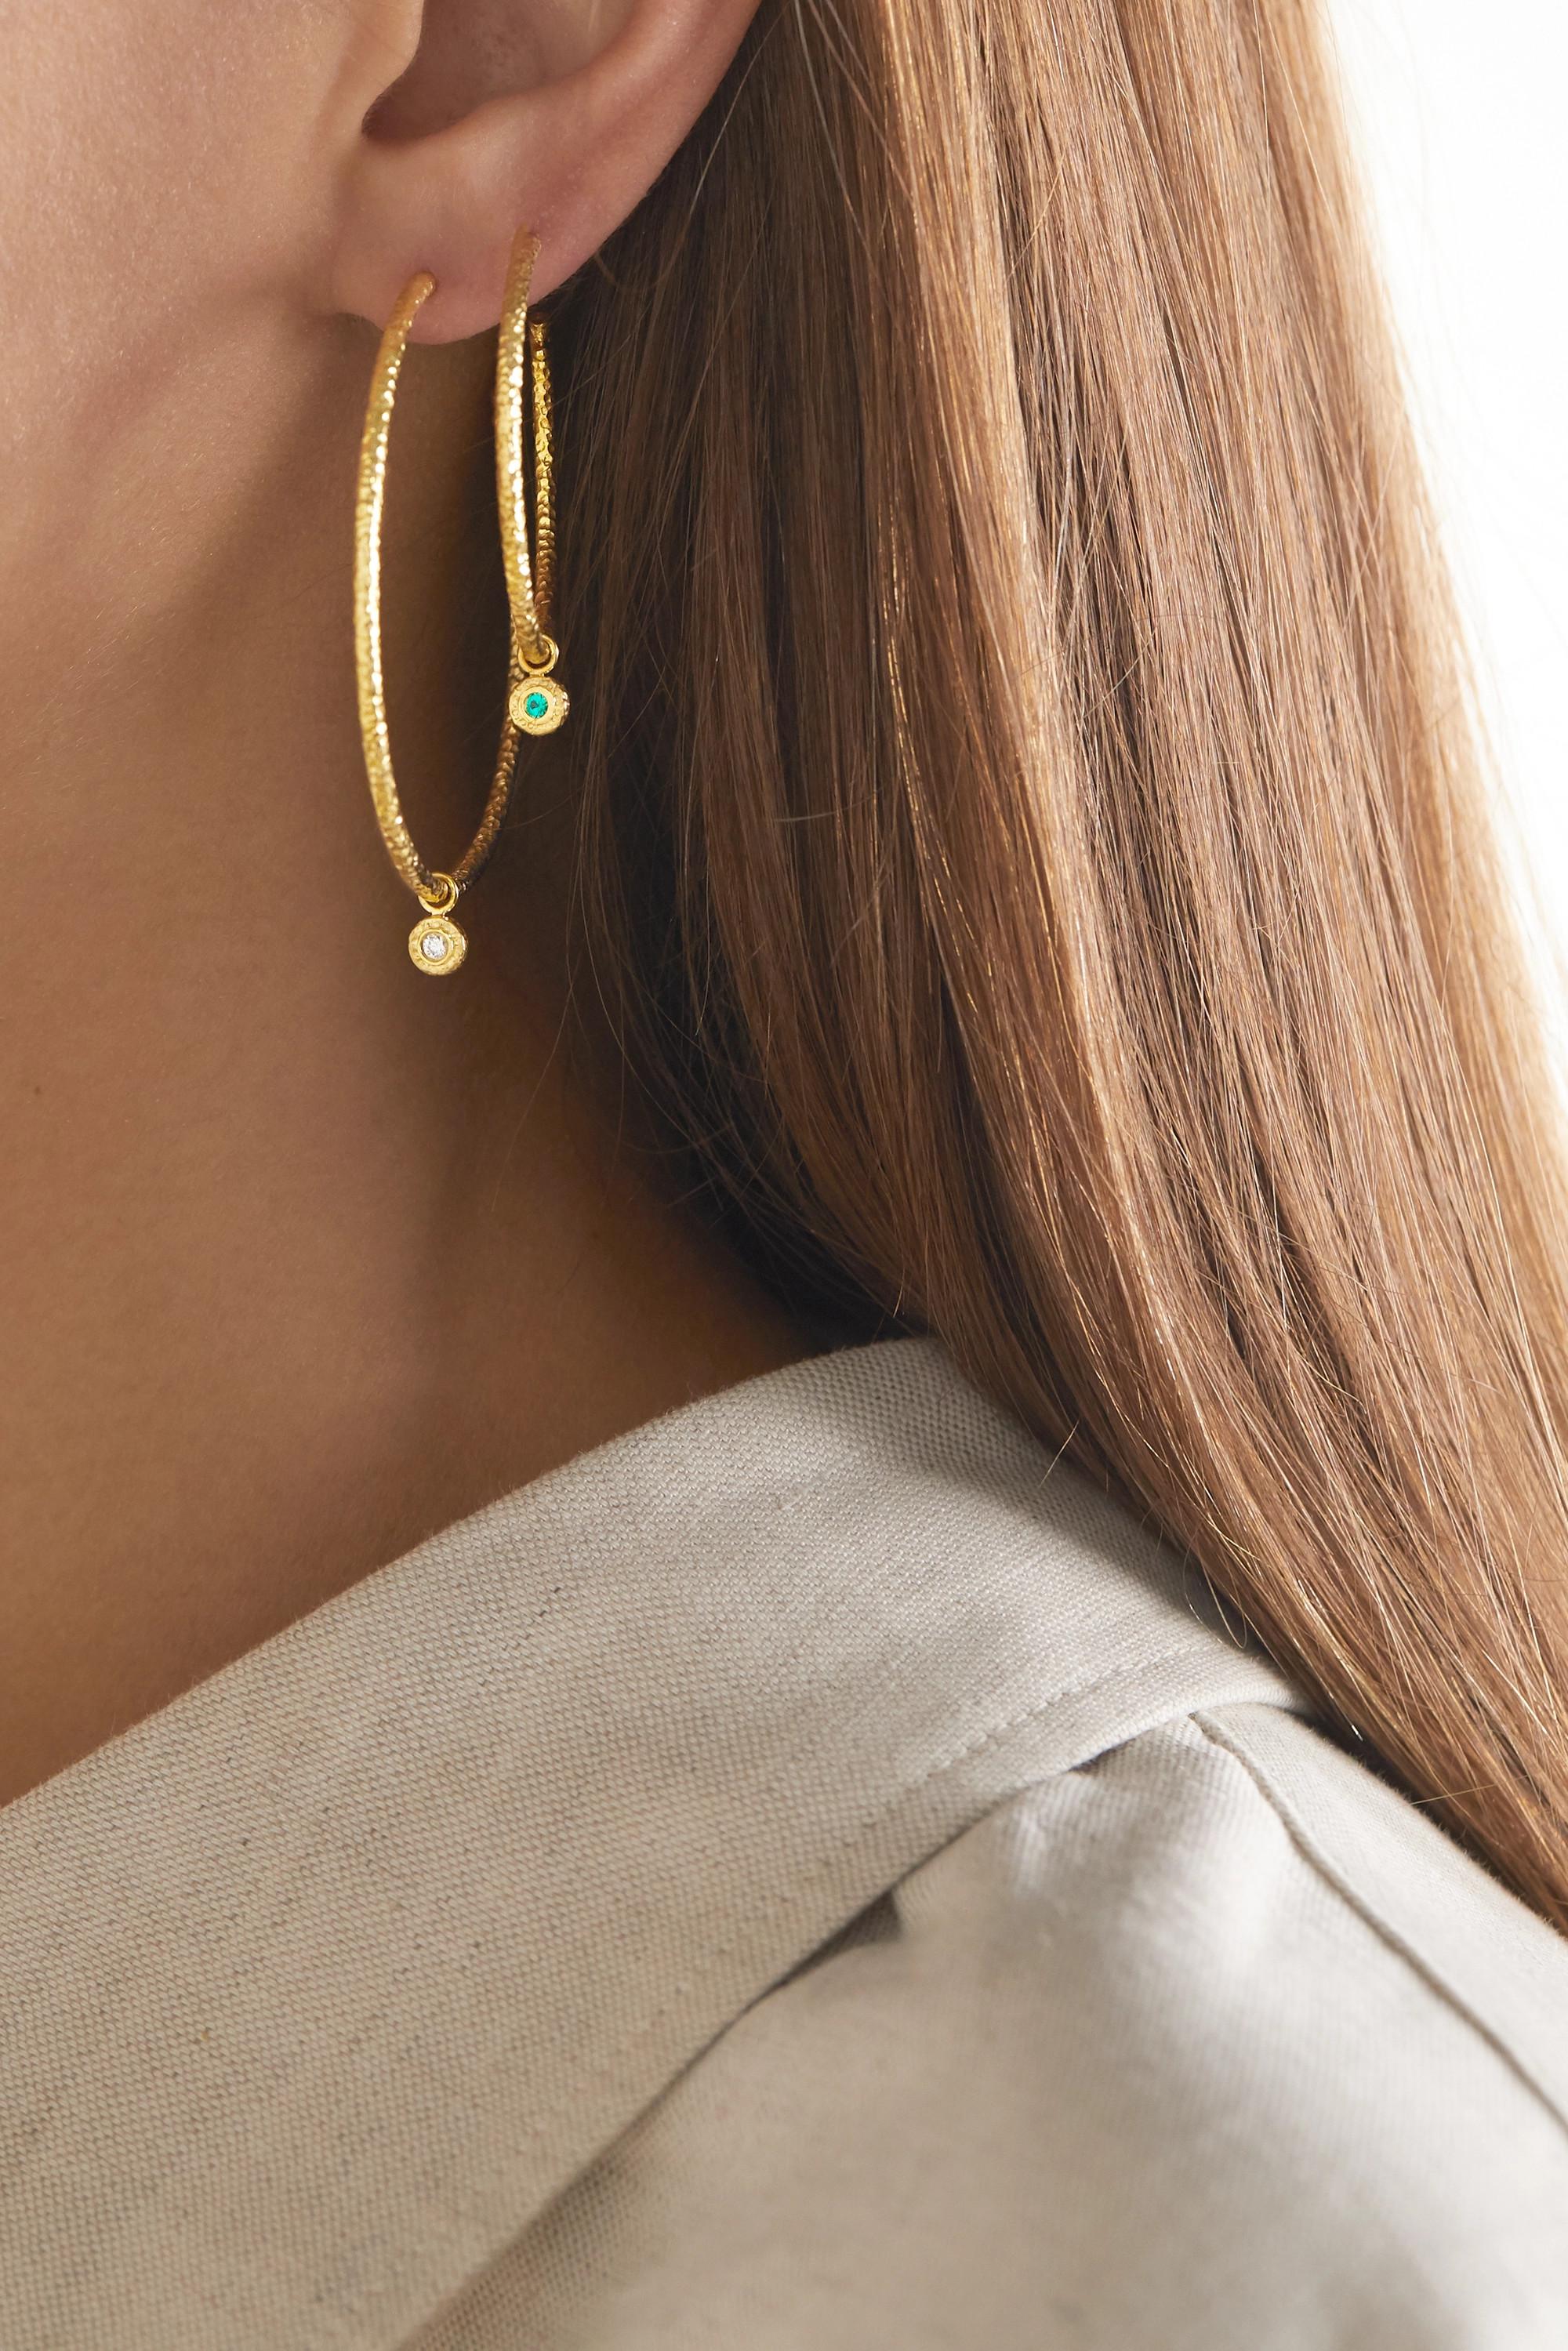 Octavia Elizabeth + NET SUSTAIN Nesting Gem 18-karat gold diamond hoop earrings